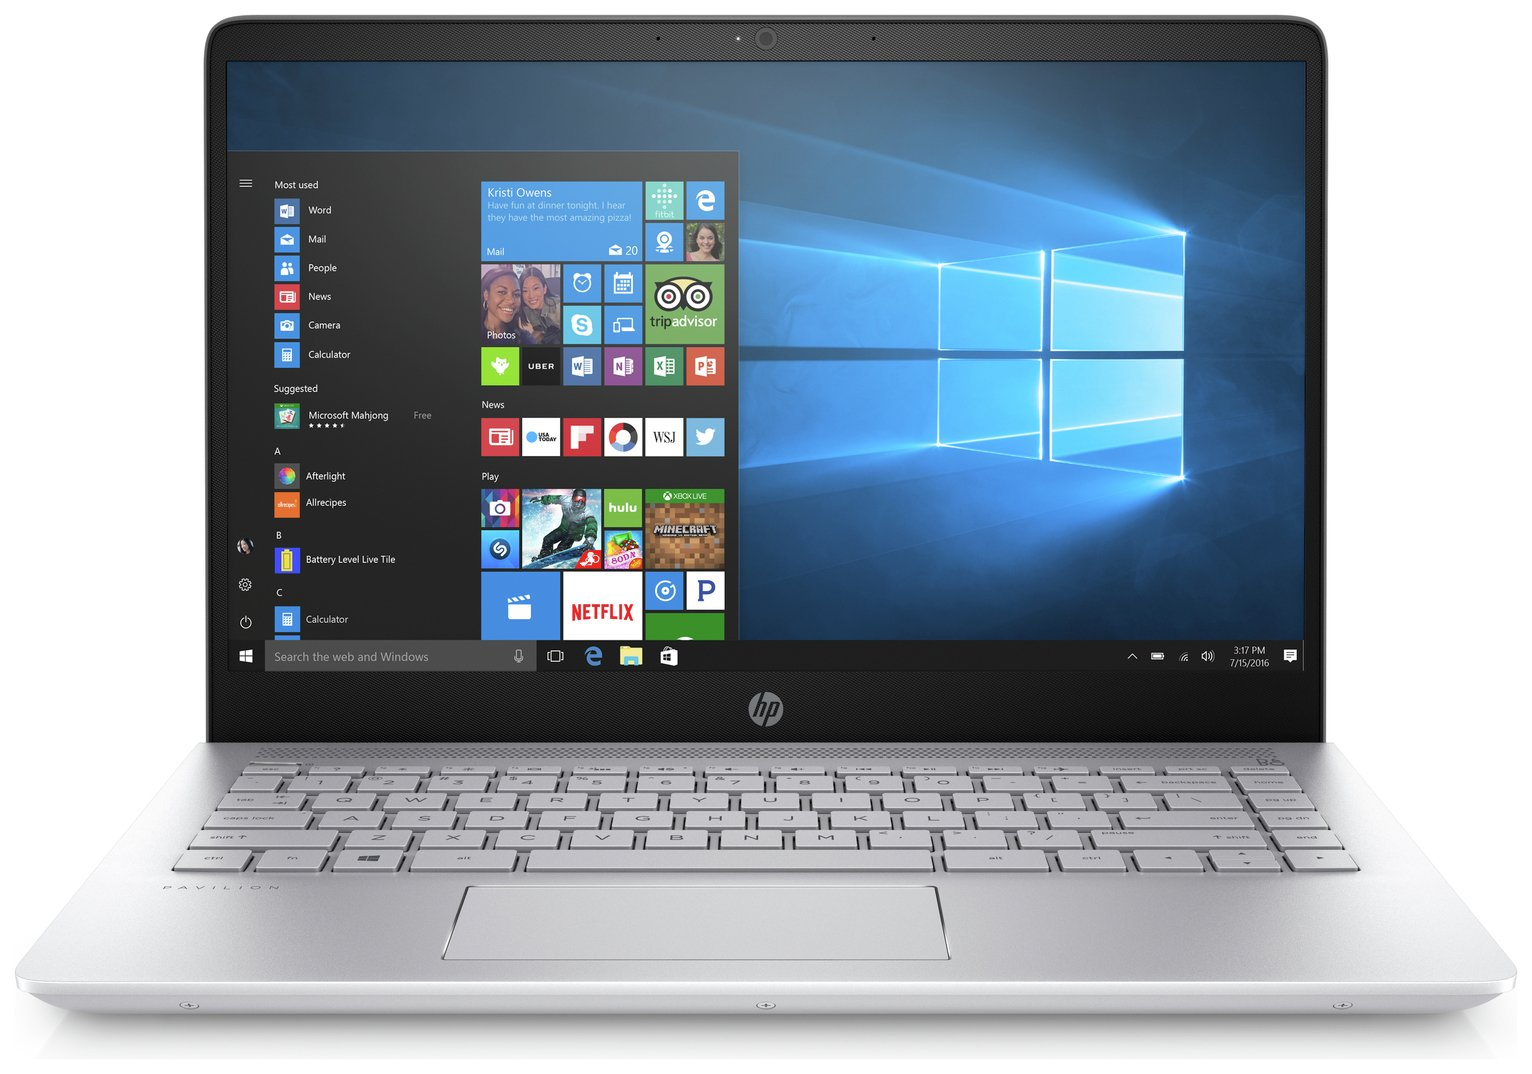 HP HP Pavilion 14 Inch Intel i5 8GB 256GB Laptop - Silver